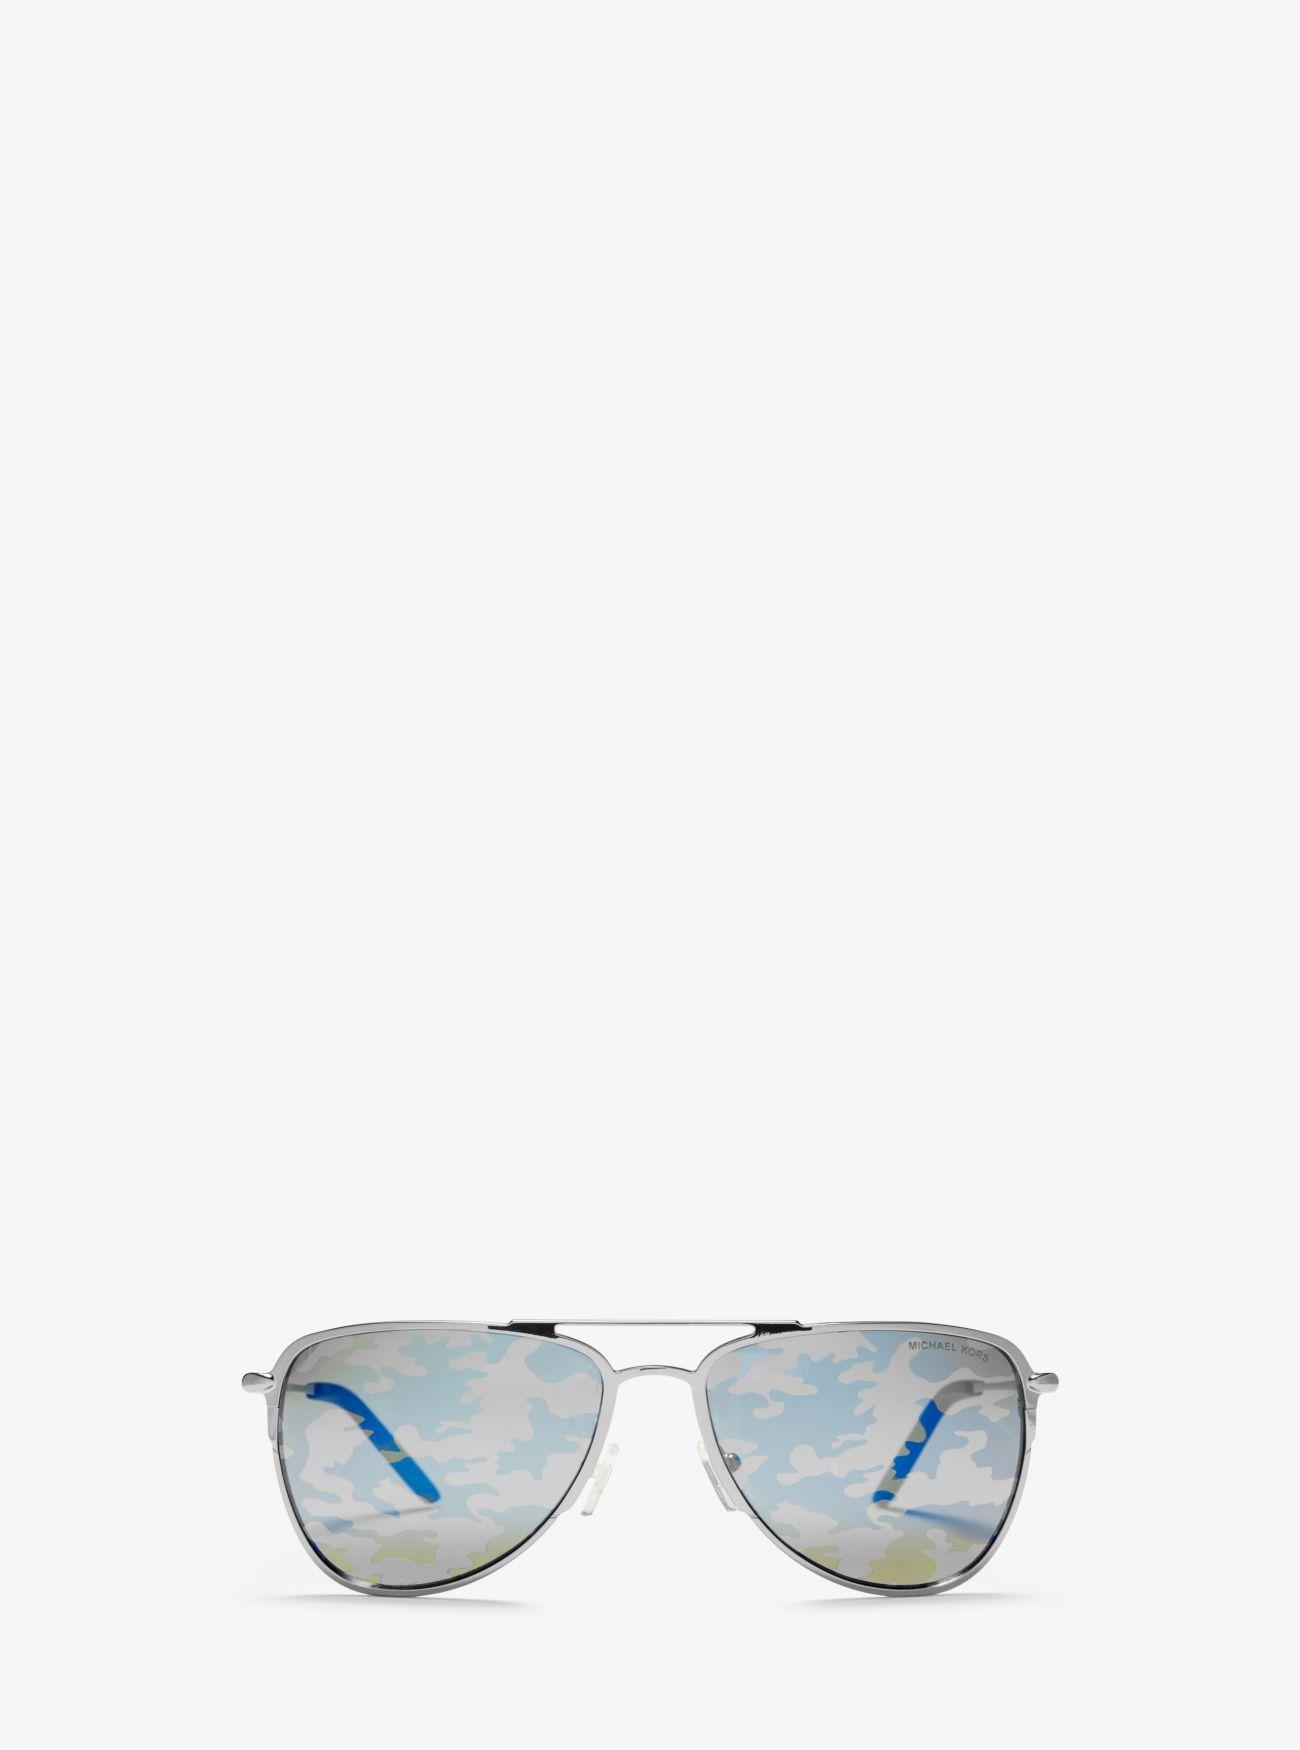 dee9d3a85140 Lyst - Michael Kors Dayton Sunglasses in Green for Men